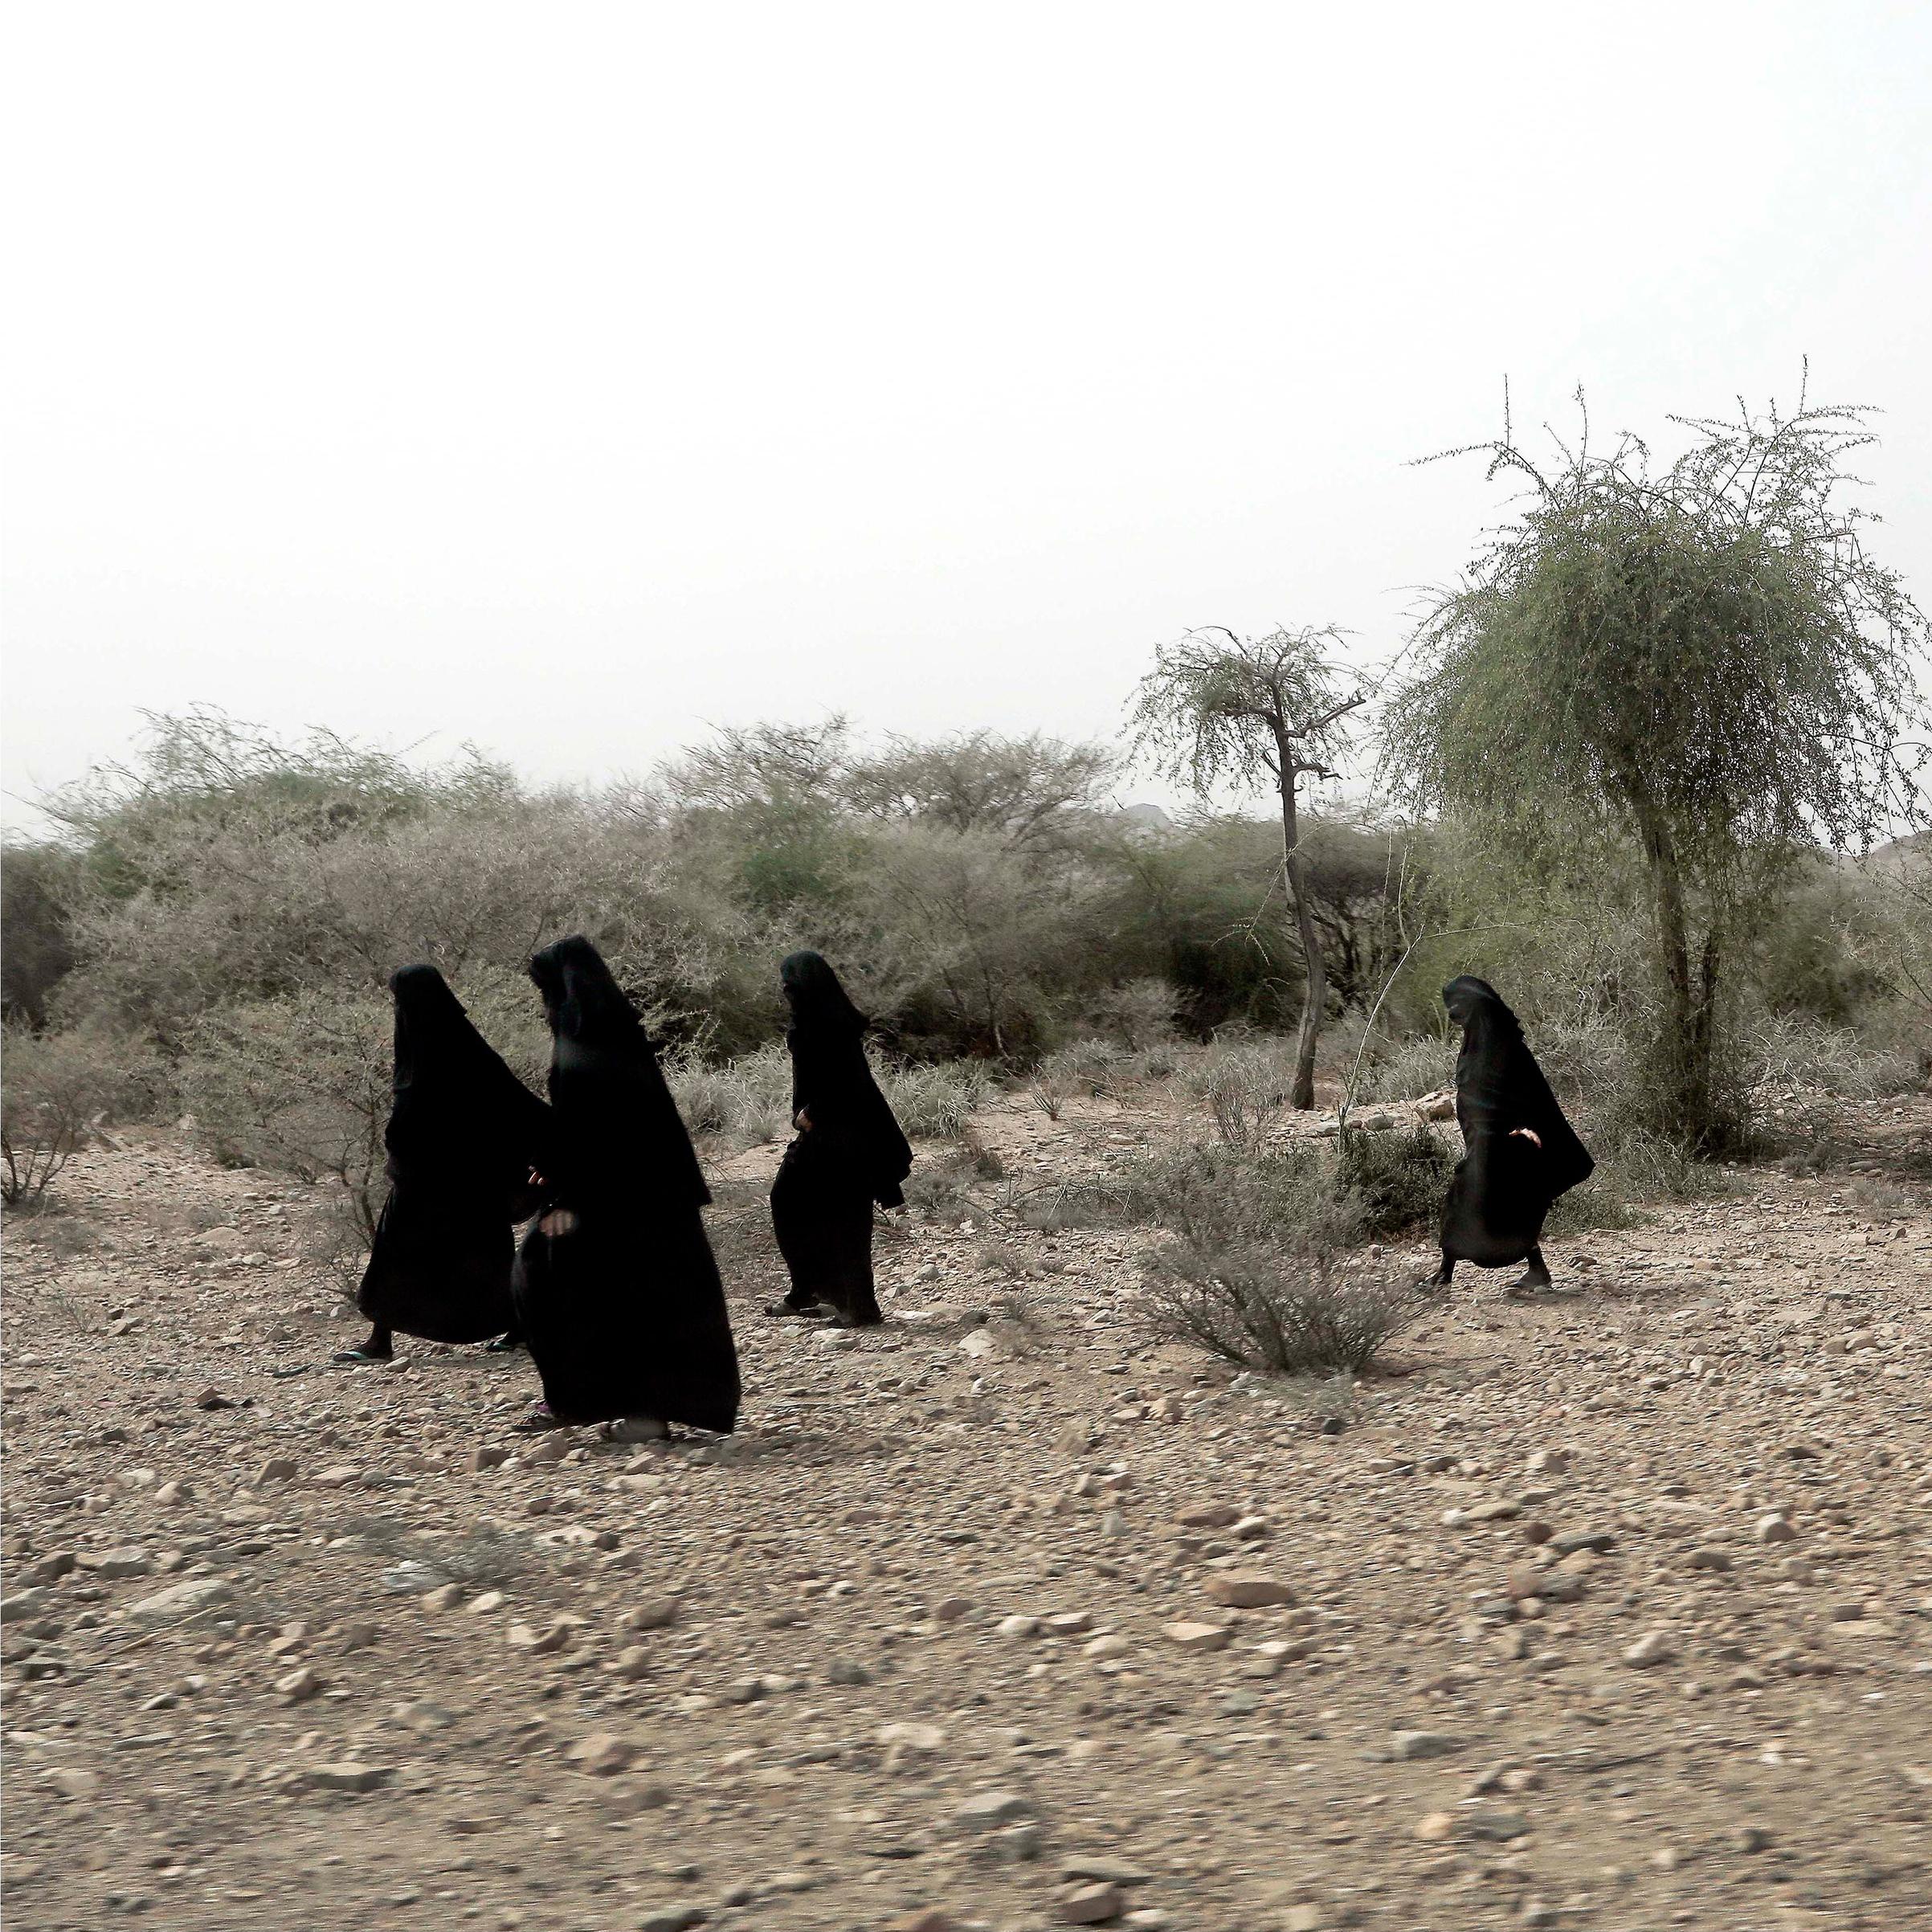 A group of women walk through Shabwa on July 24.